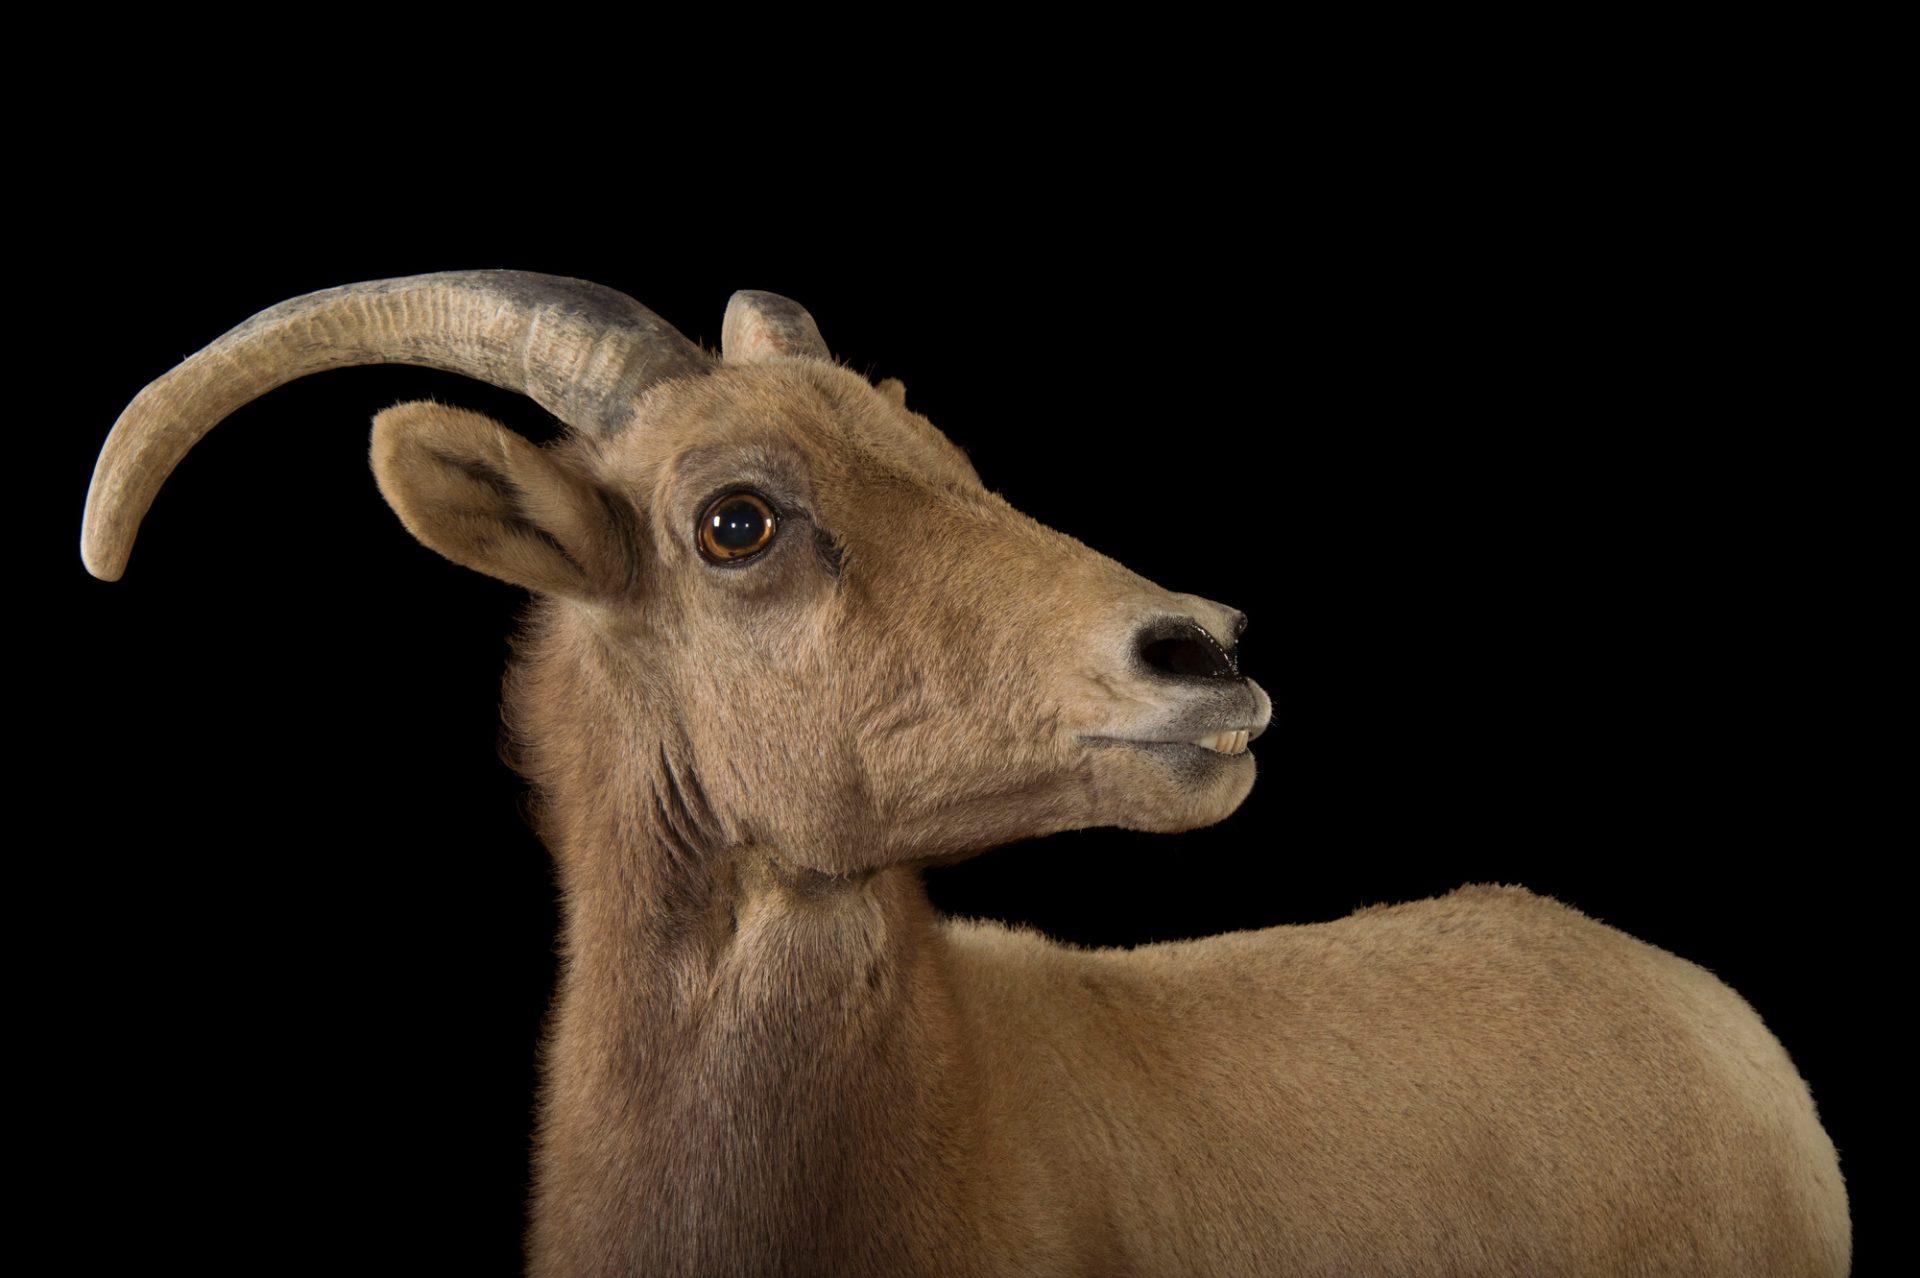 A federally endangered female desert bighorn sheep (Ovis canadensis nelsoni) named April at The Living Desert in Palm Desert, California.